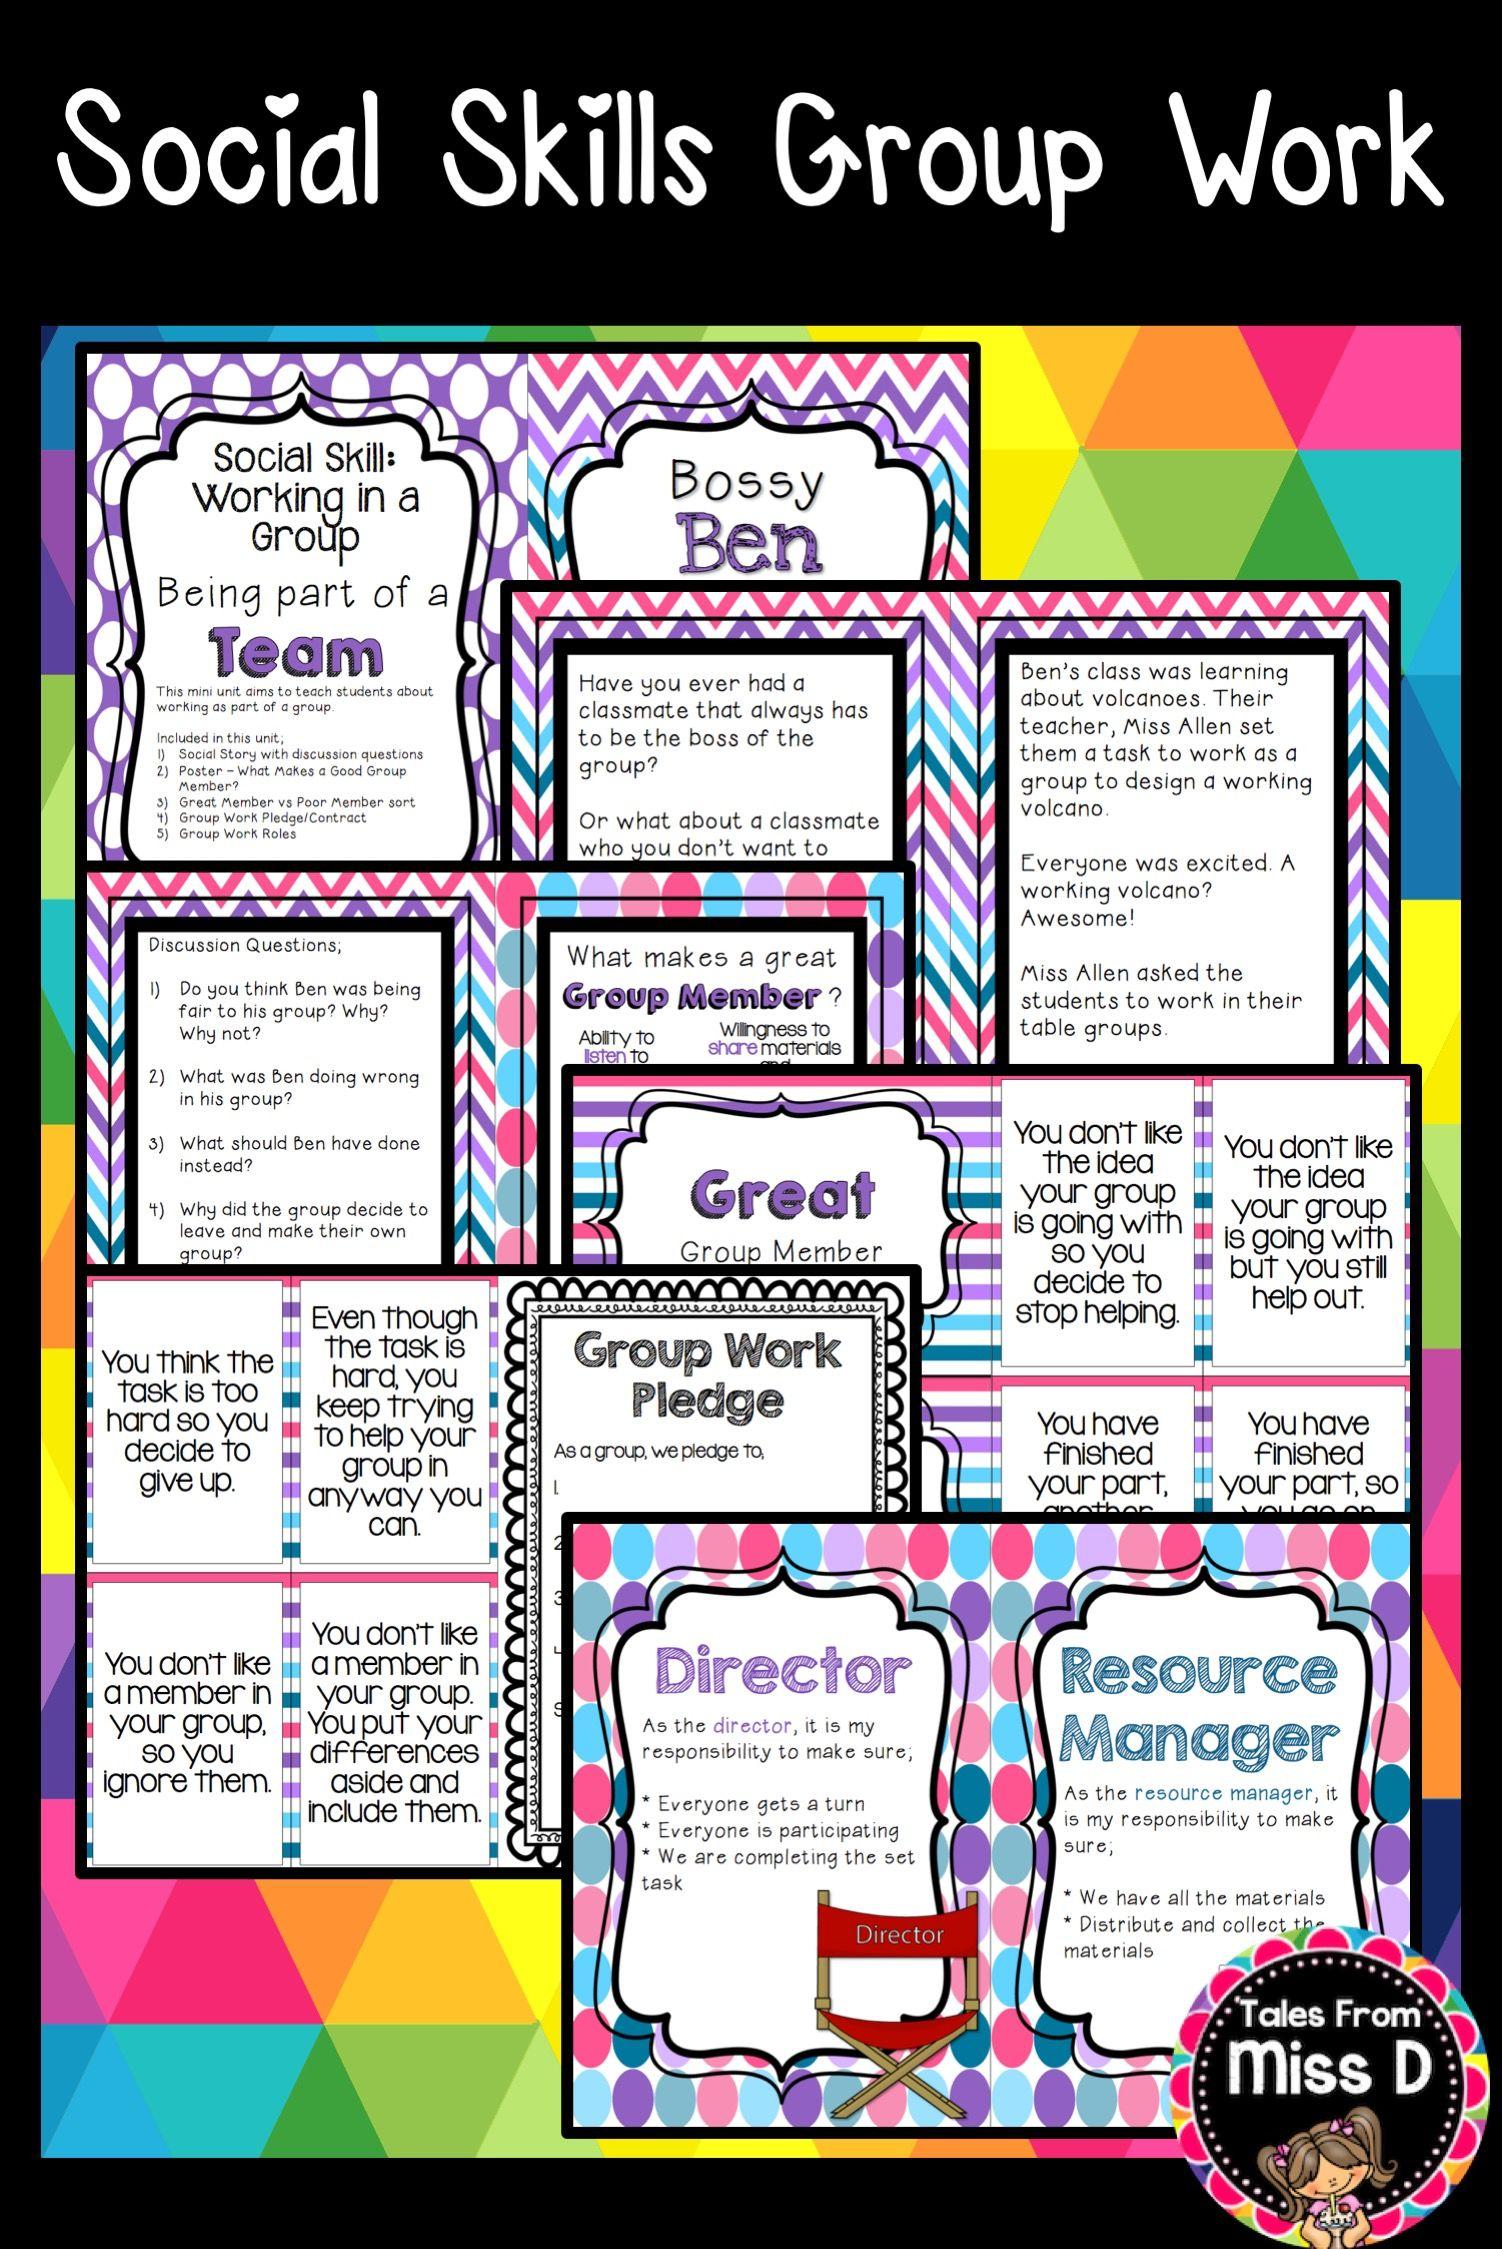 Social Skills Group Work